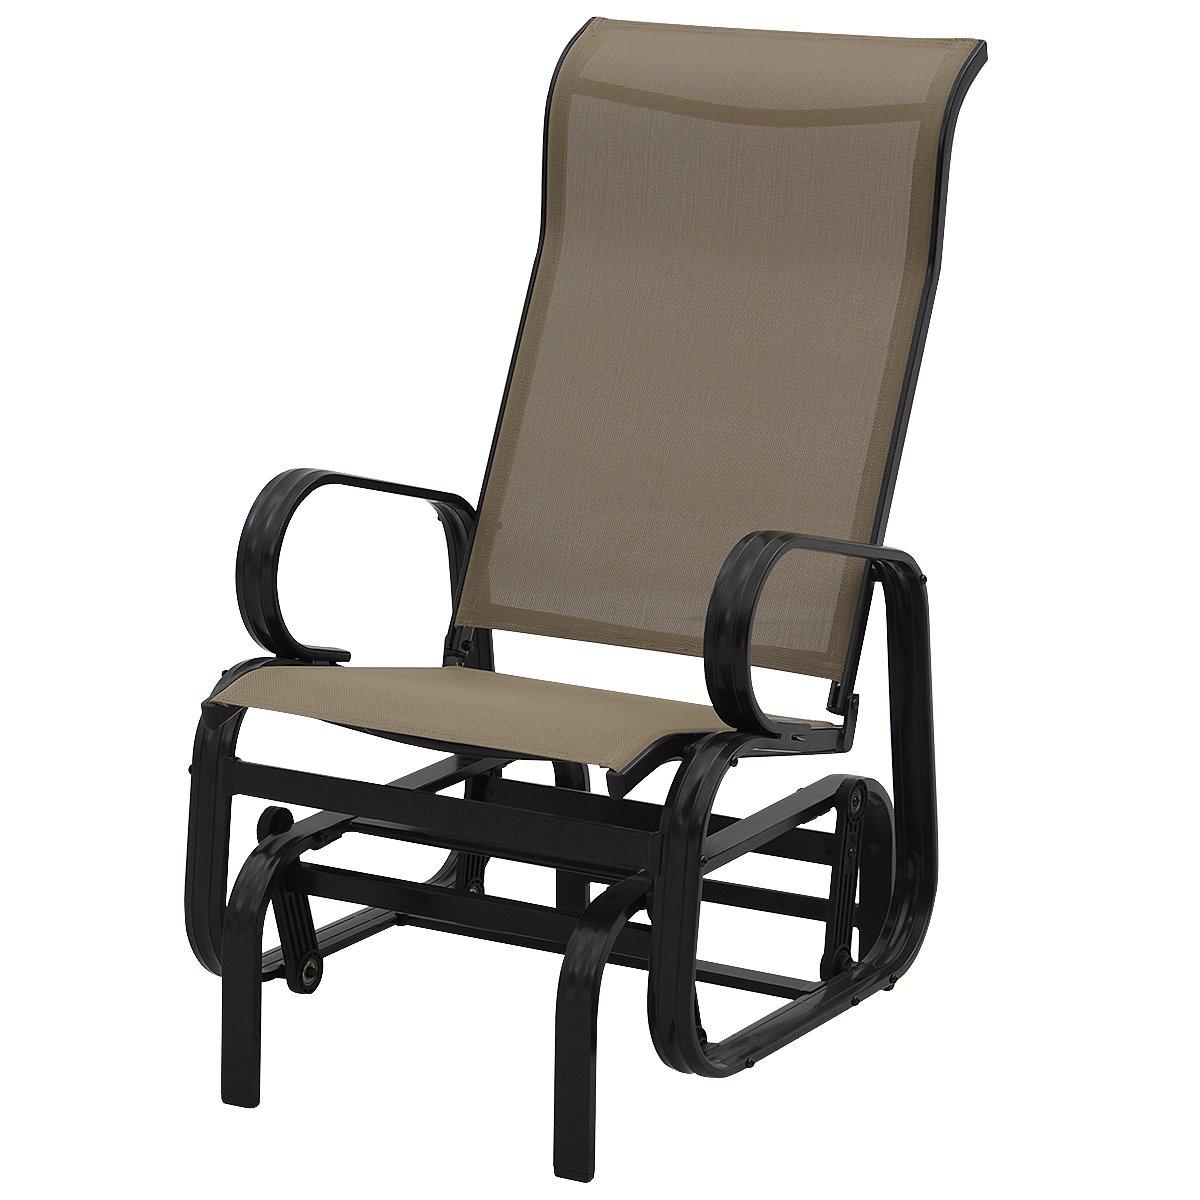 Giantex Outdoor Patio Glider Rocking Chair Bench Rocker Patio Armchair (Light Brown)